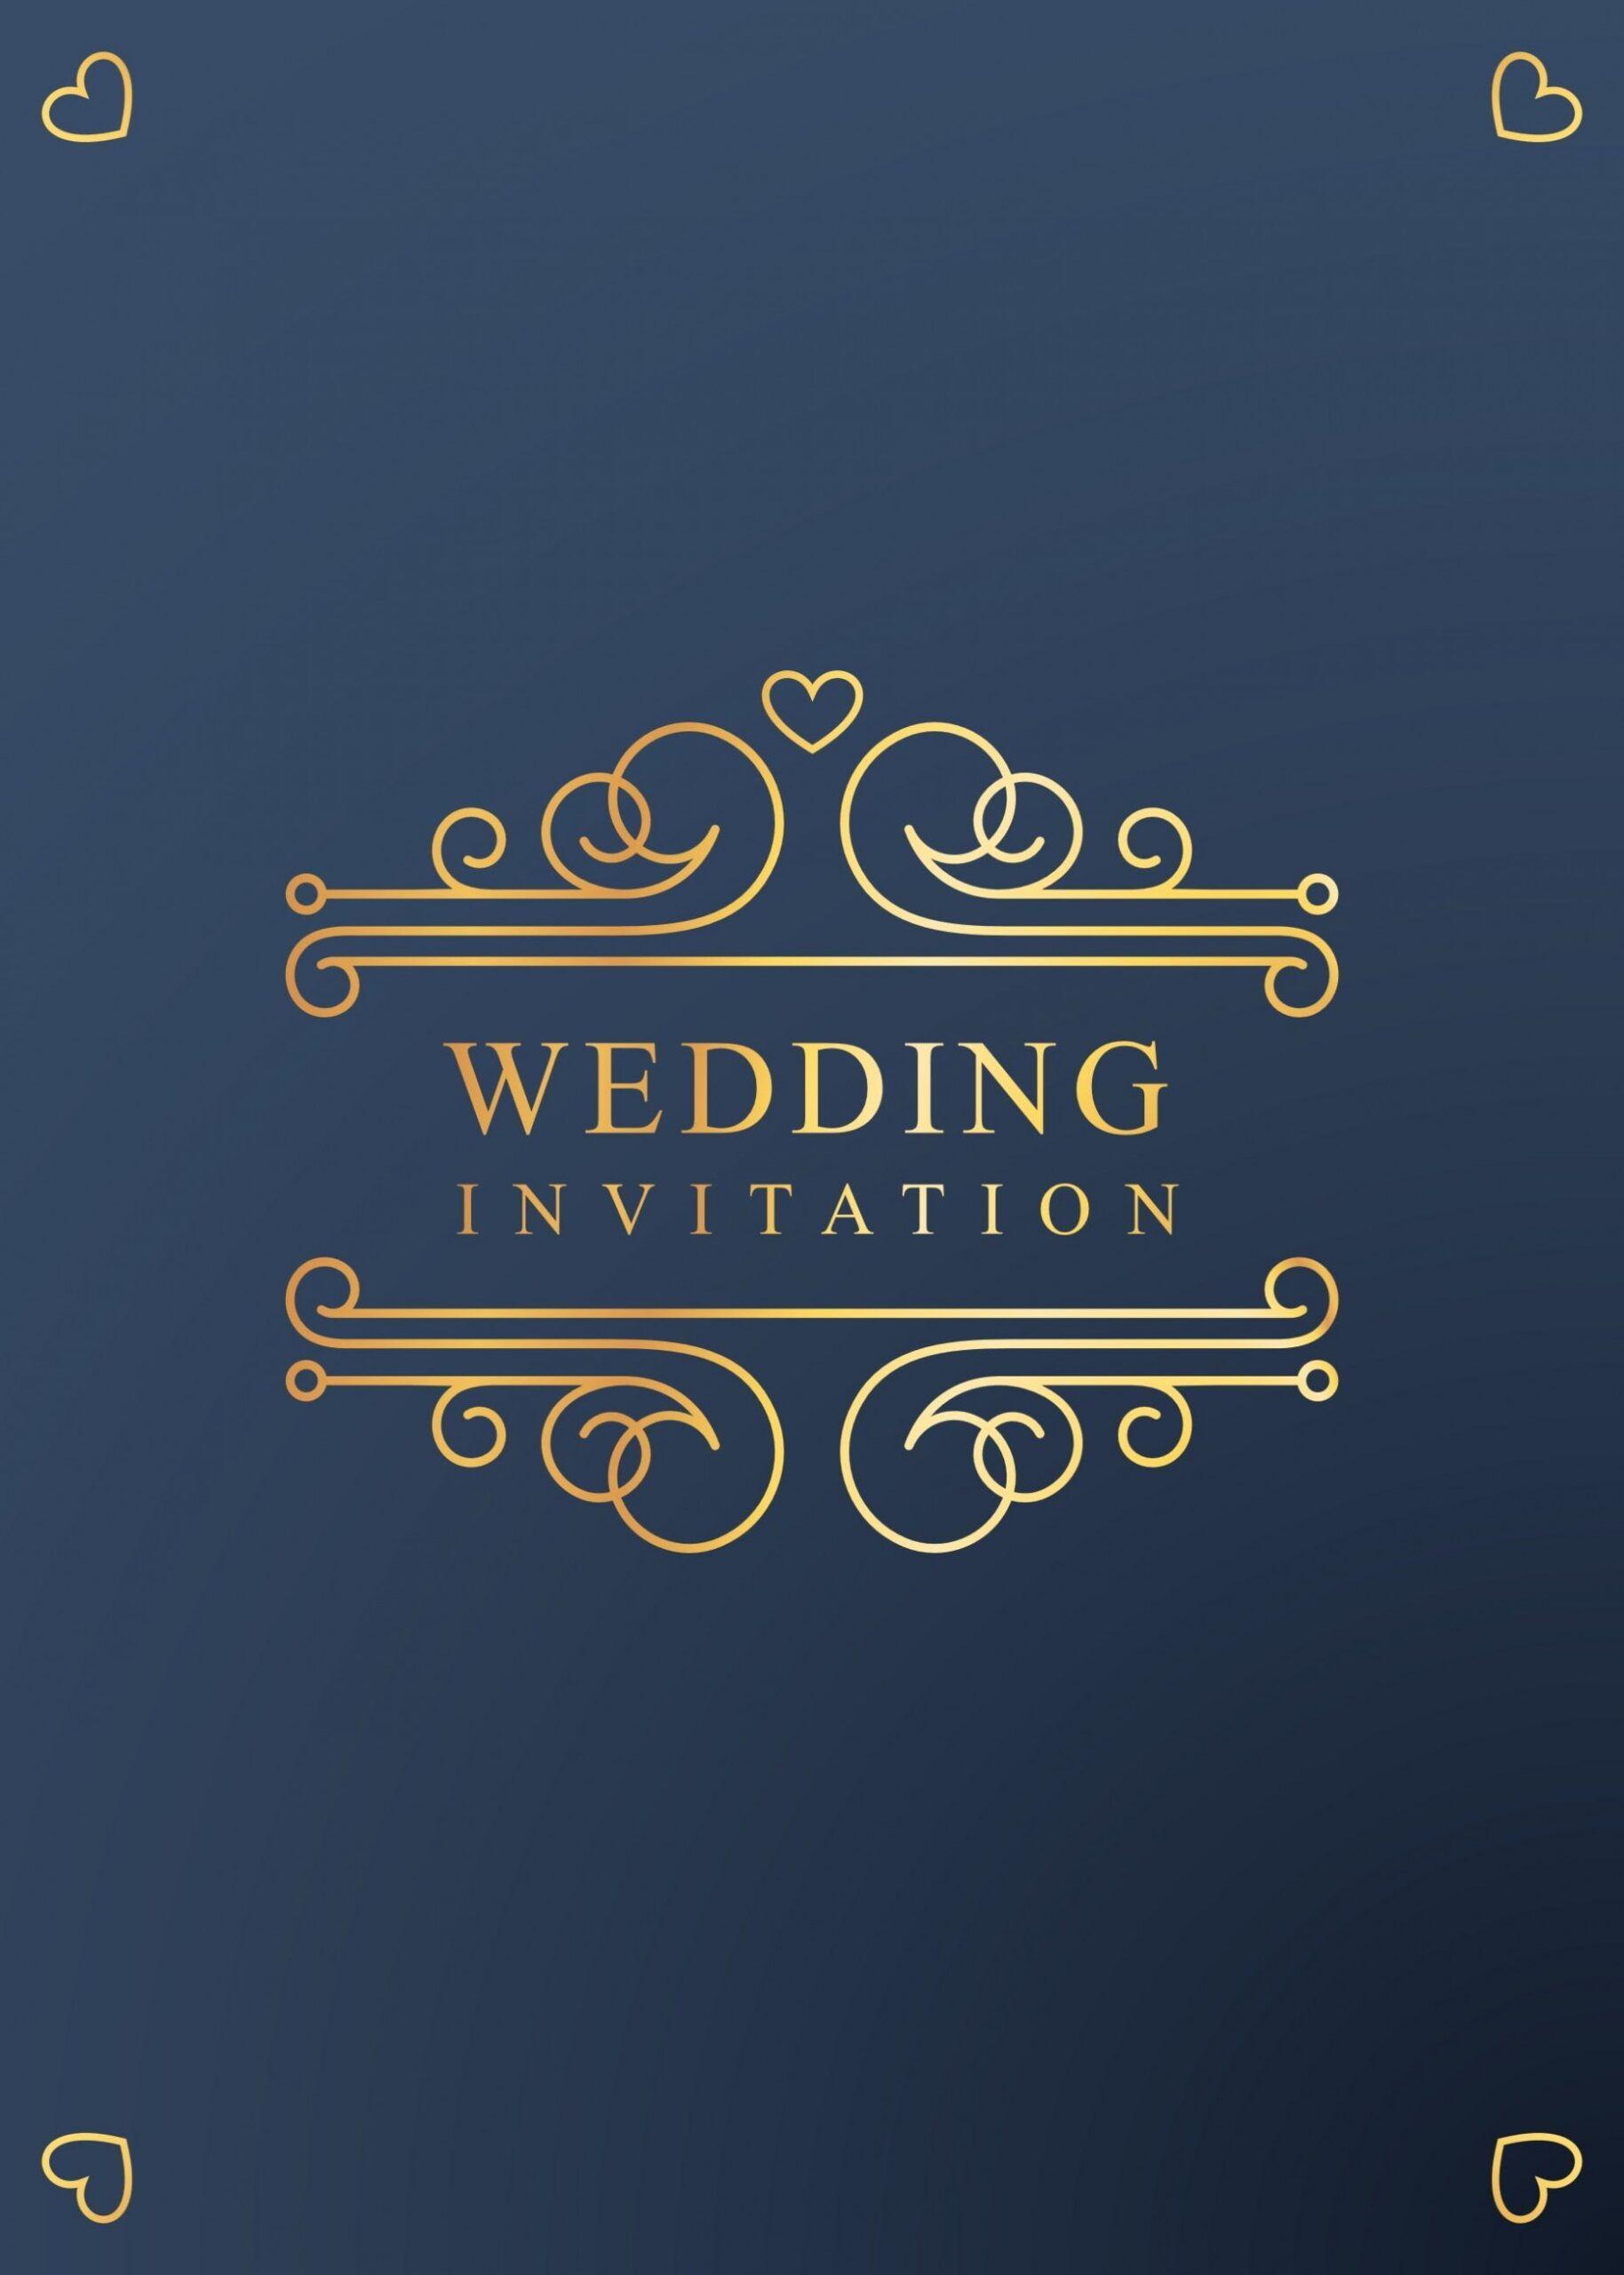 9 Top Image Invitation Cards Design In 2020 Simple Wedding Invitation Card Wedding Invitation Card Design Invitation Card Design